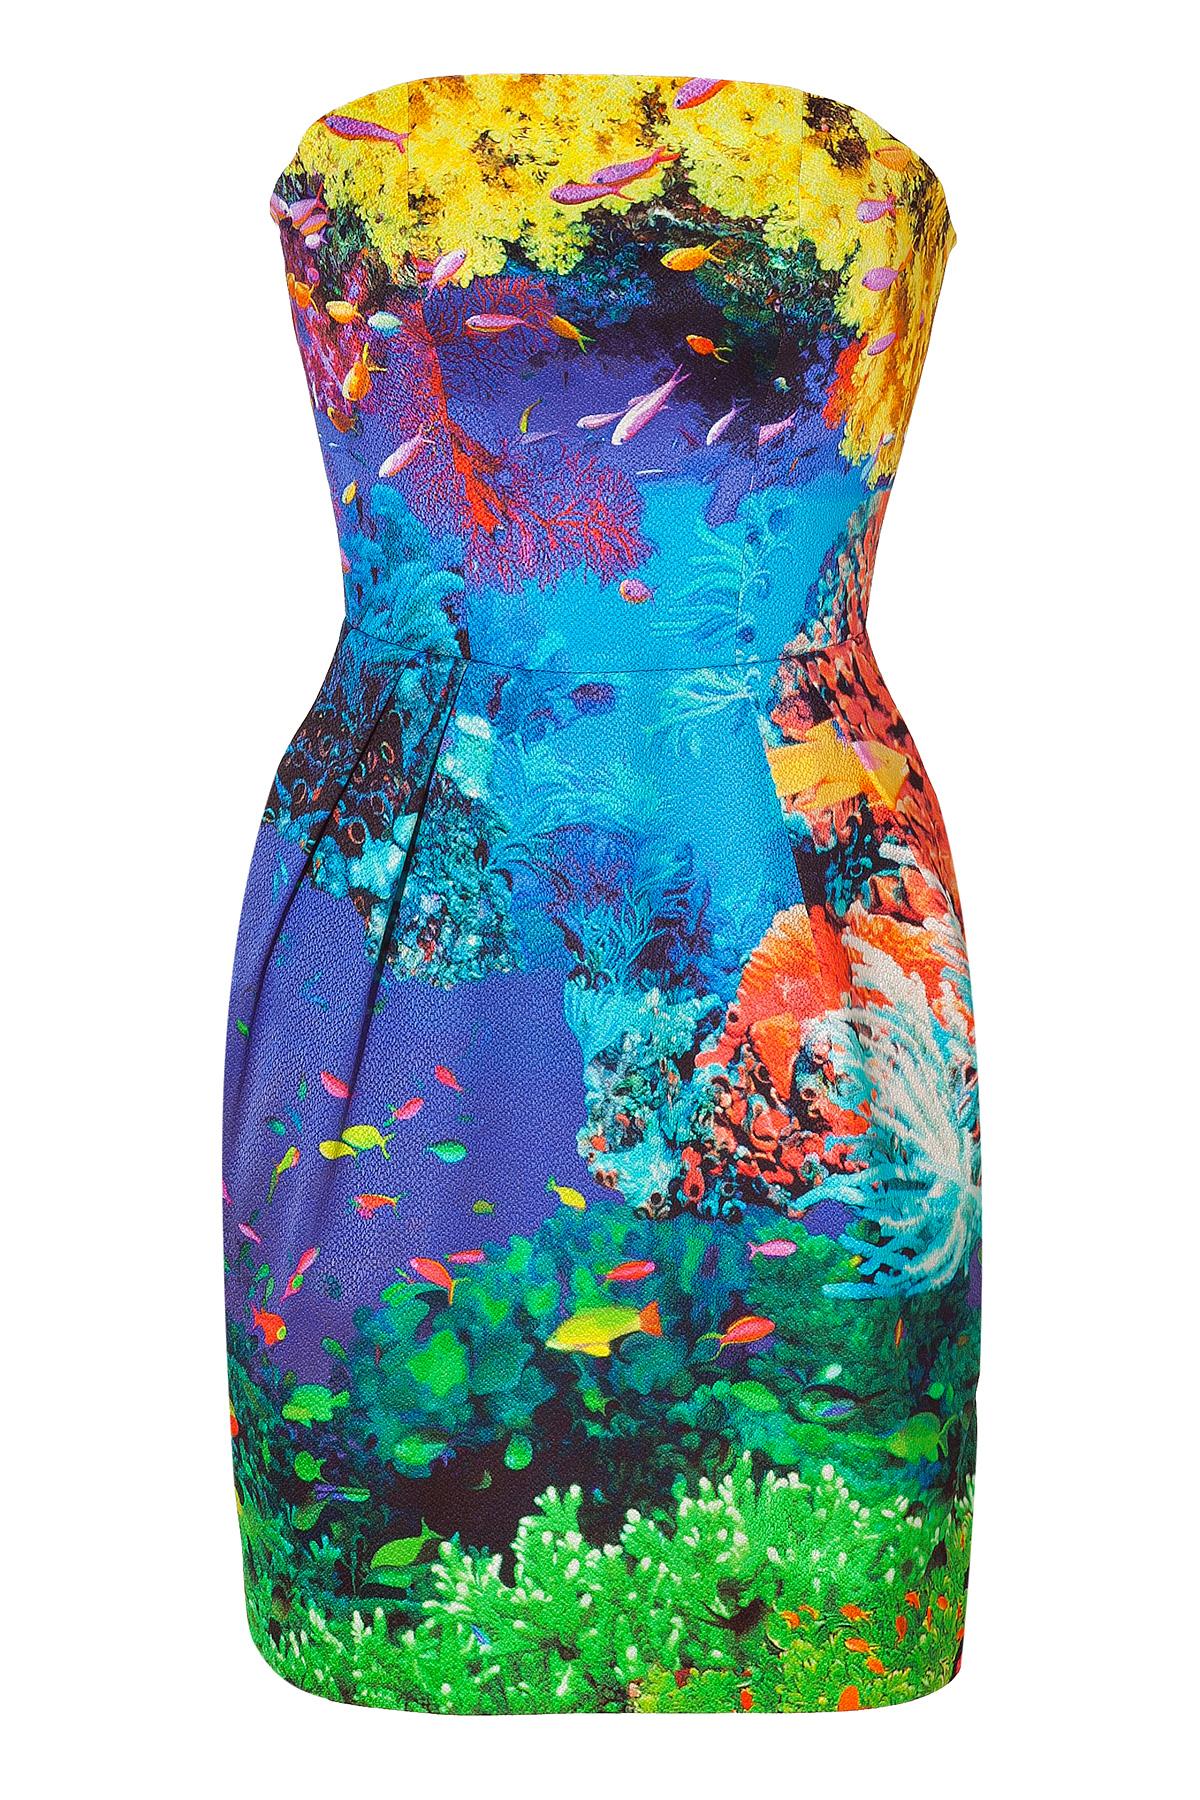 Lyst Mary Katrantzou Coral Reef Strapless Puff Dress